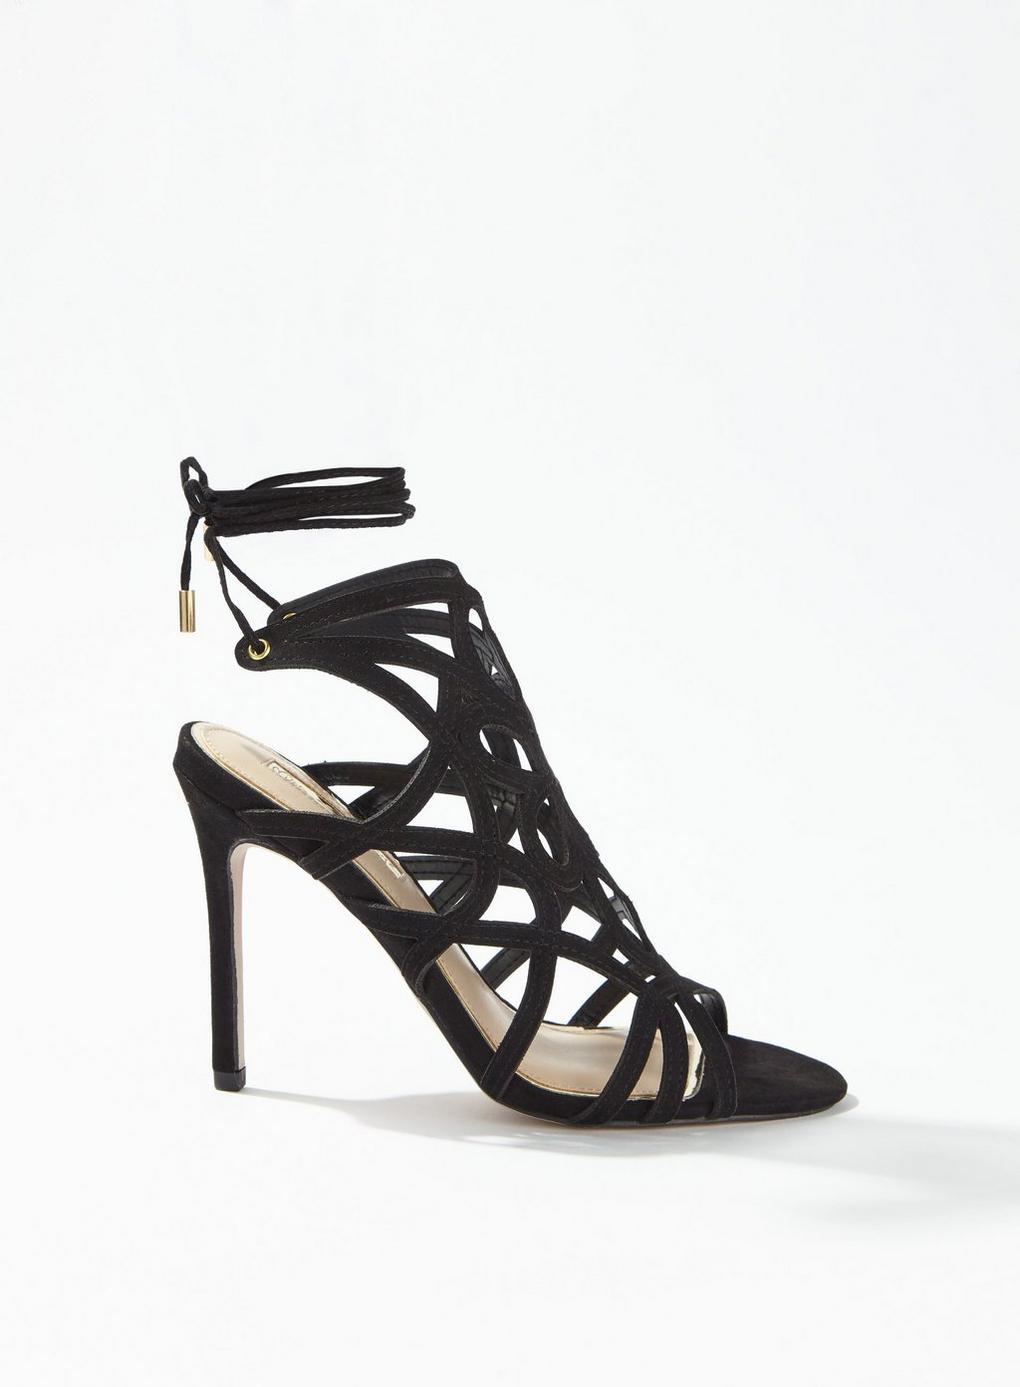 d9914e5d42ef4 Lyst - Miss Selfridge Black Hun Caged Stiletto Heel Sandals in Black